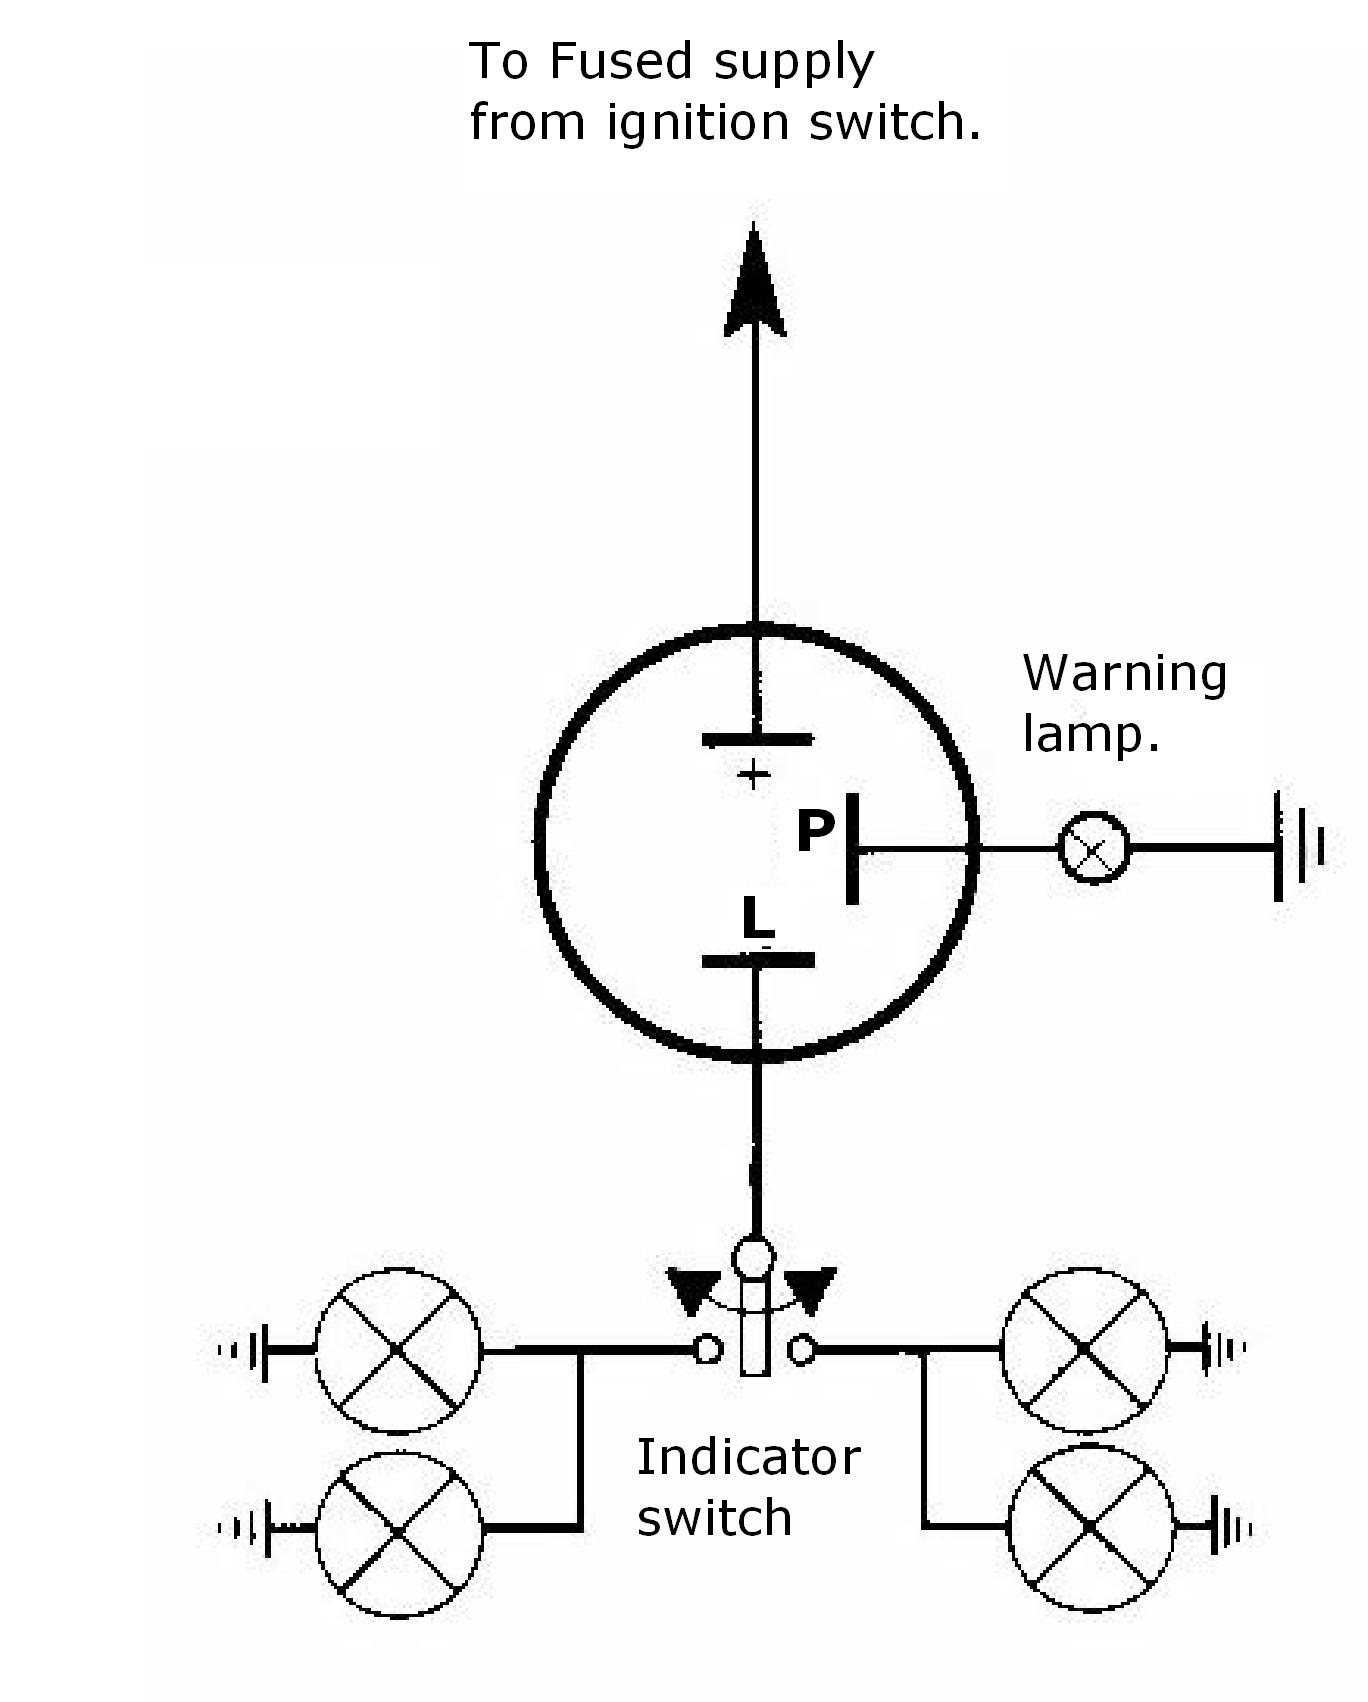 Turn Signal Relay Wiring February 2015 – the Racing Rhino Of Turn Signal Relay Wiring